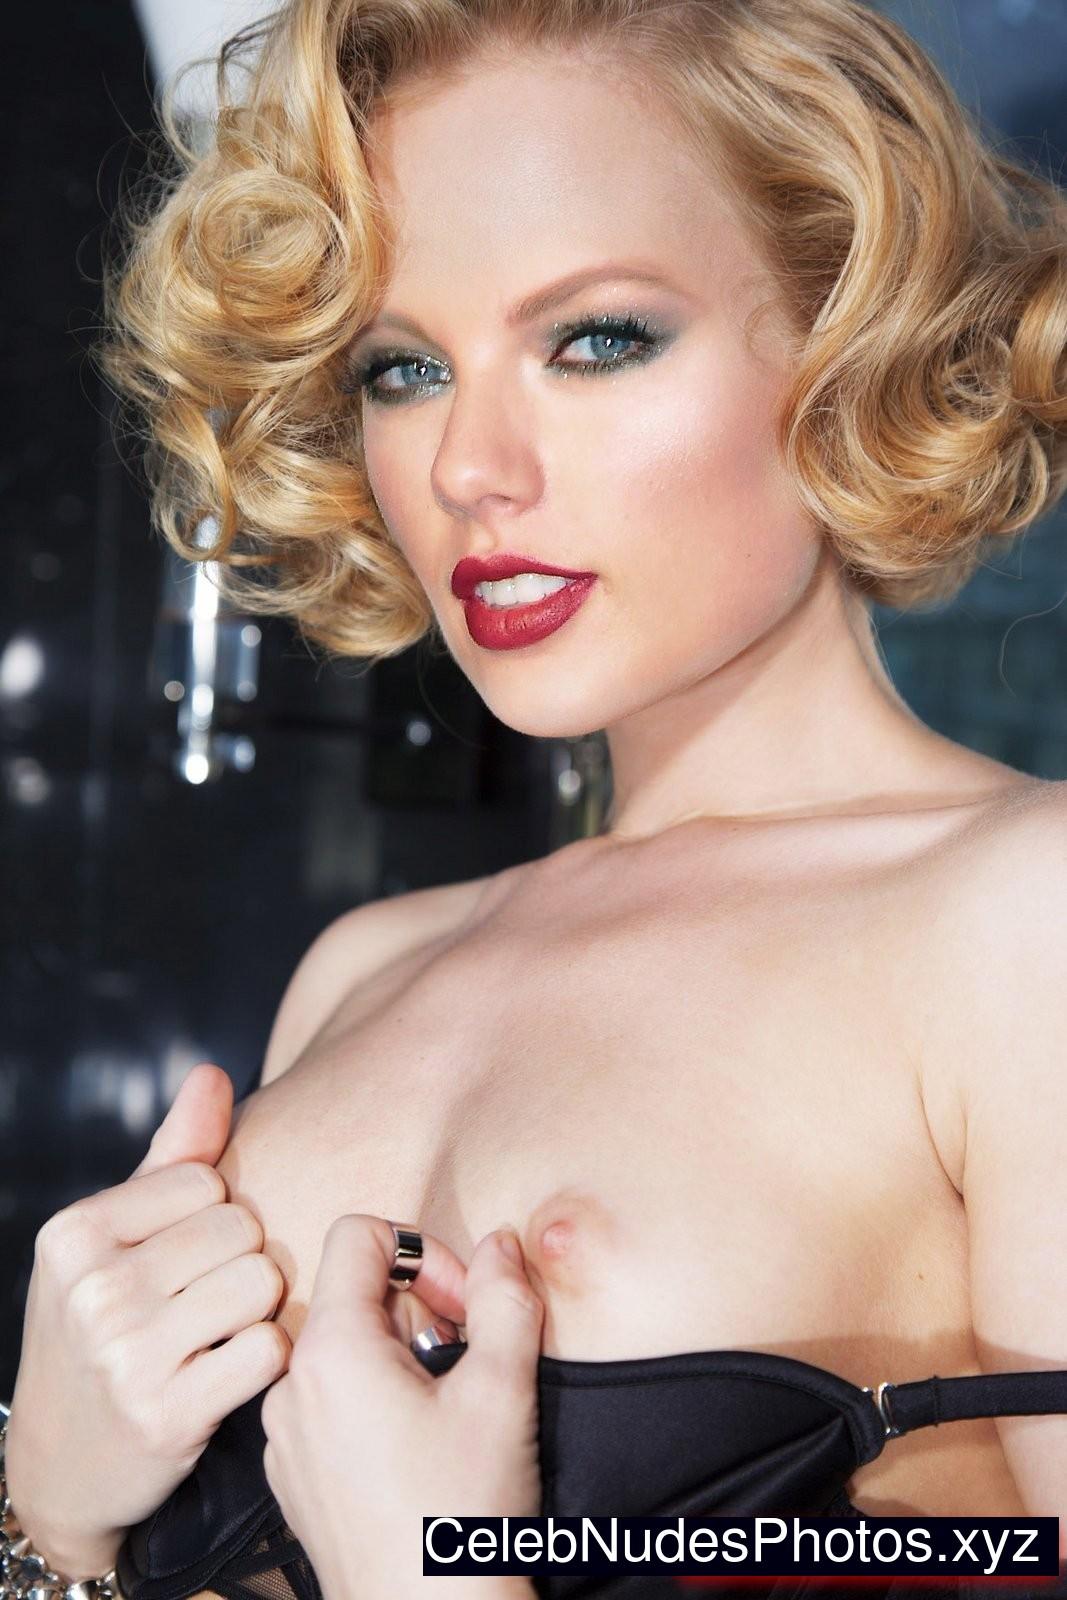 T Swift naked celebrity pics